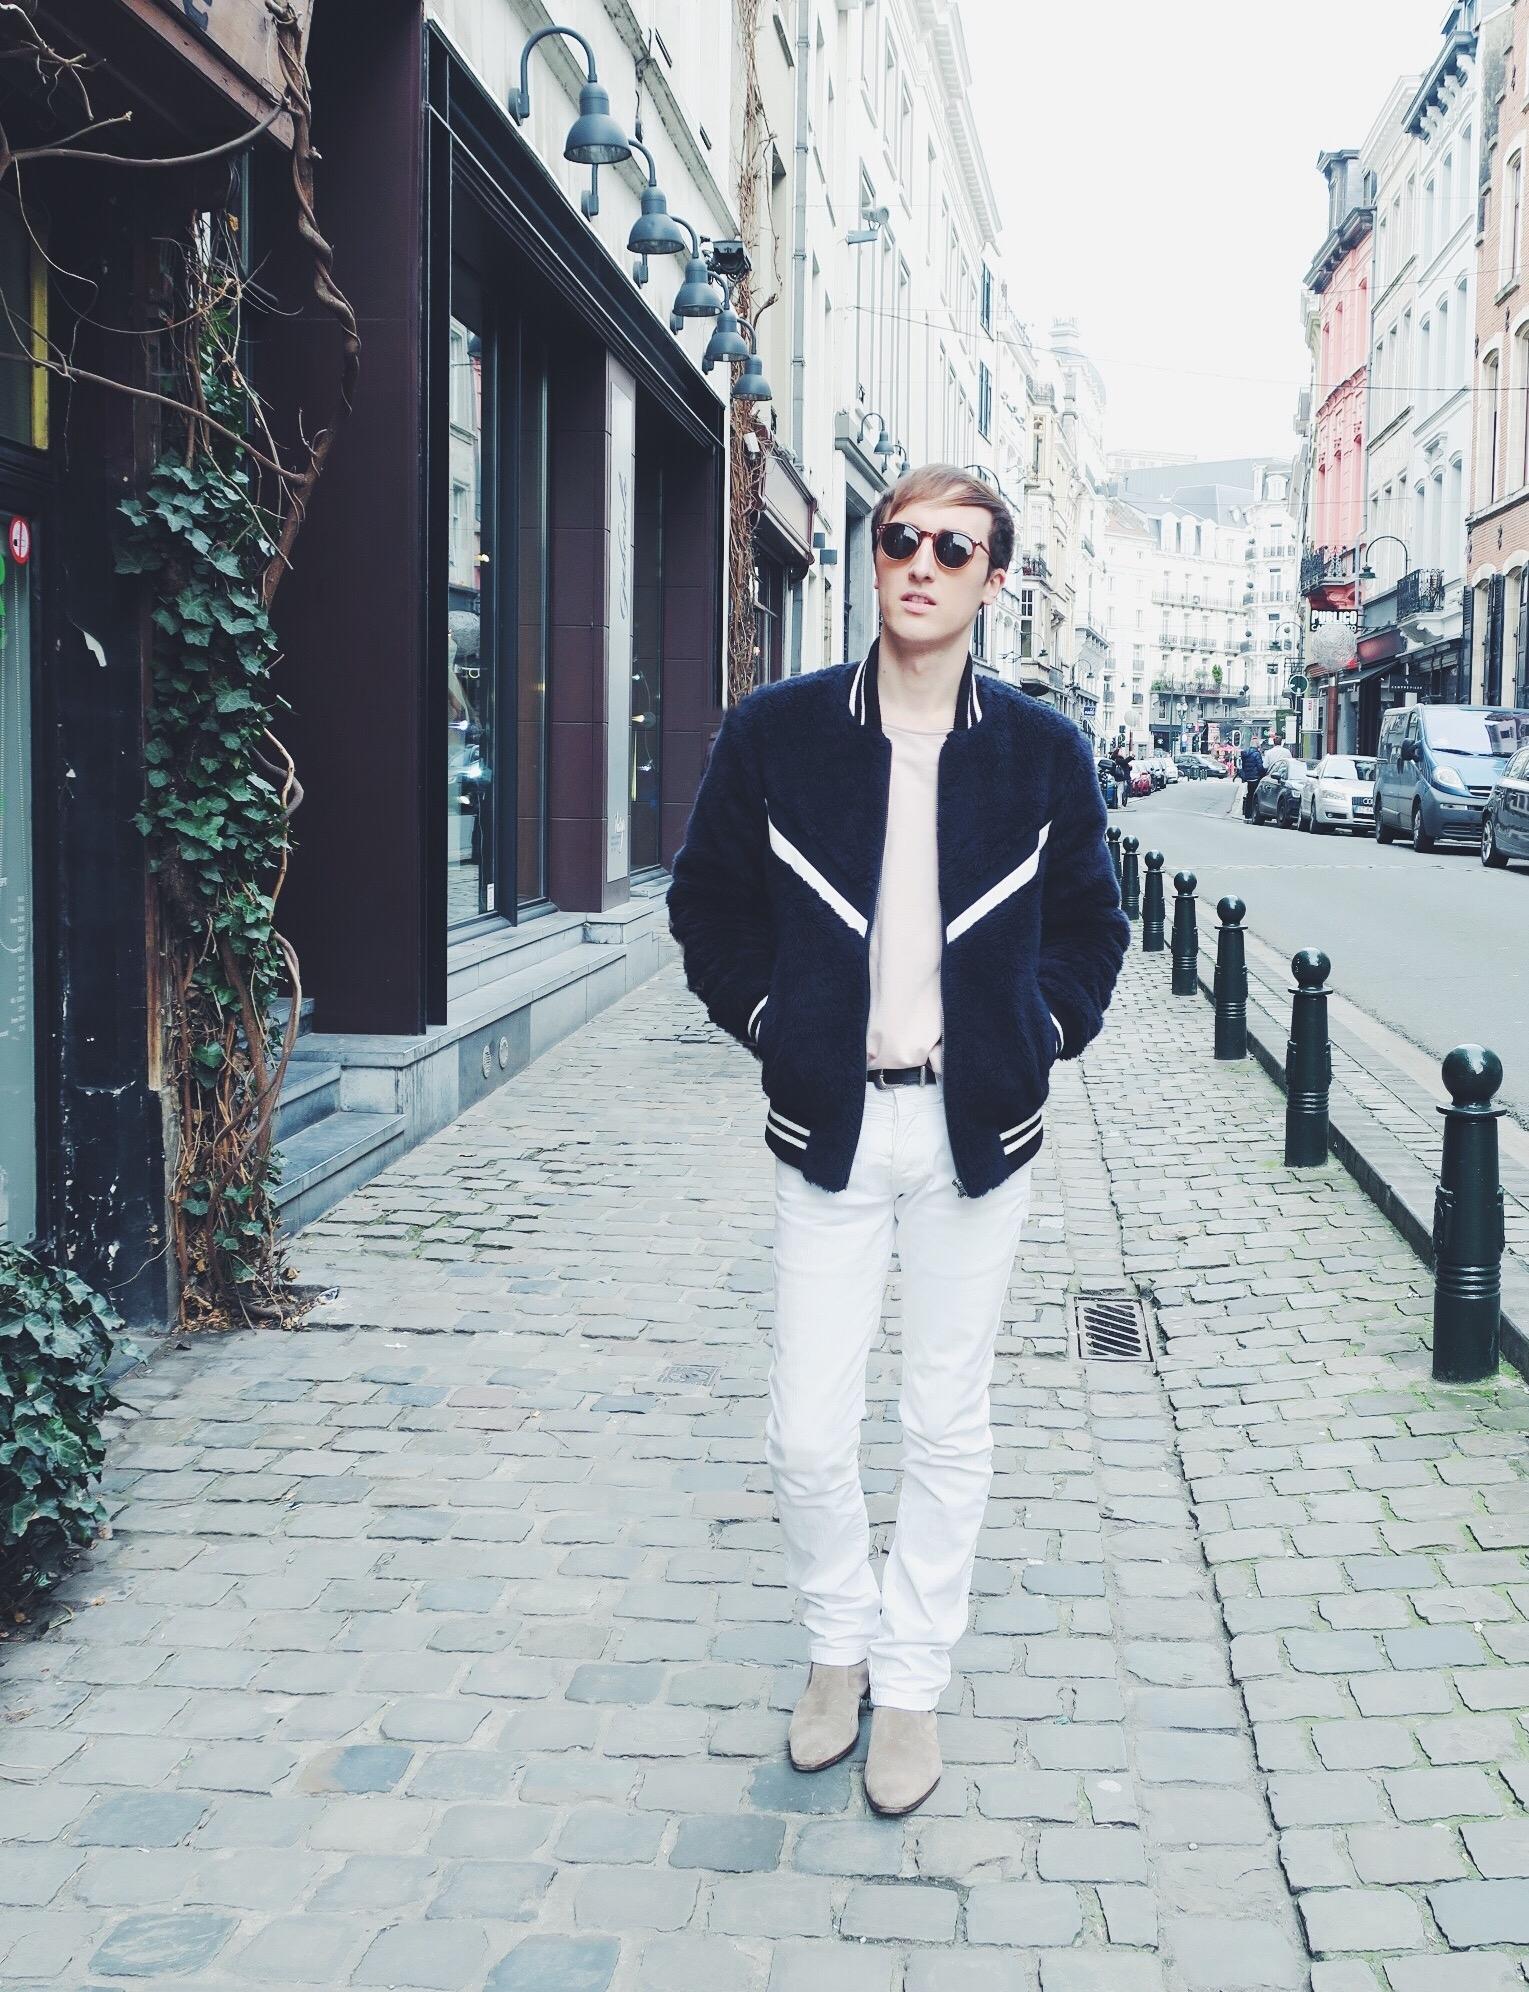 Essentiel bomber jacket - Cos sweater - Zara trousers - Zara belt - Zign boots via Zalando - Asos sunglasses